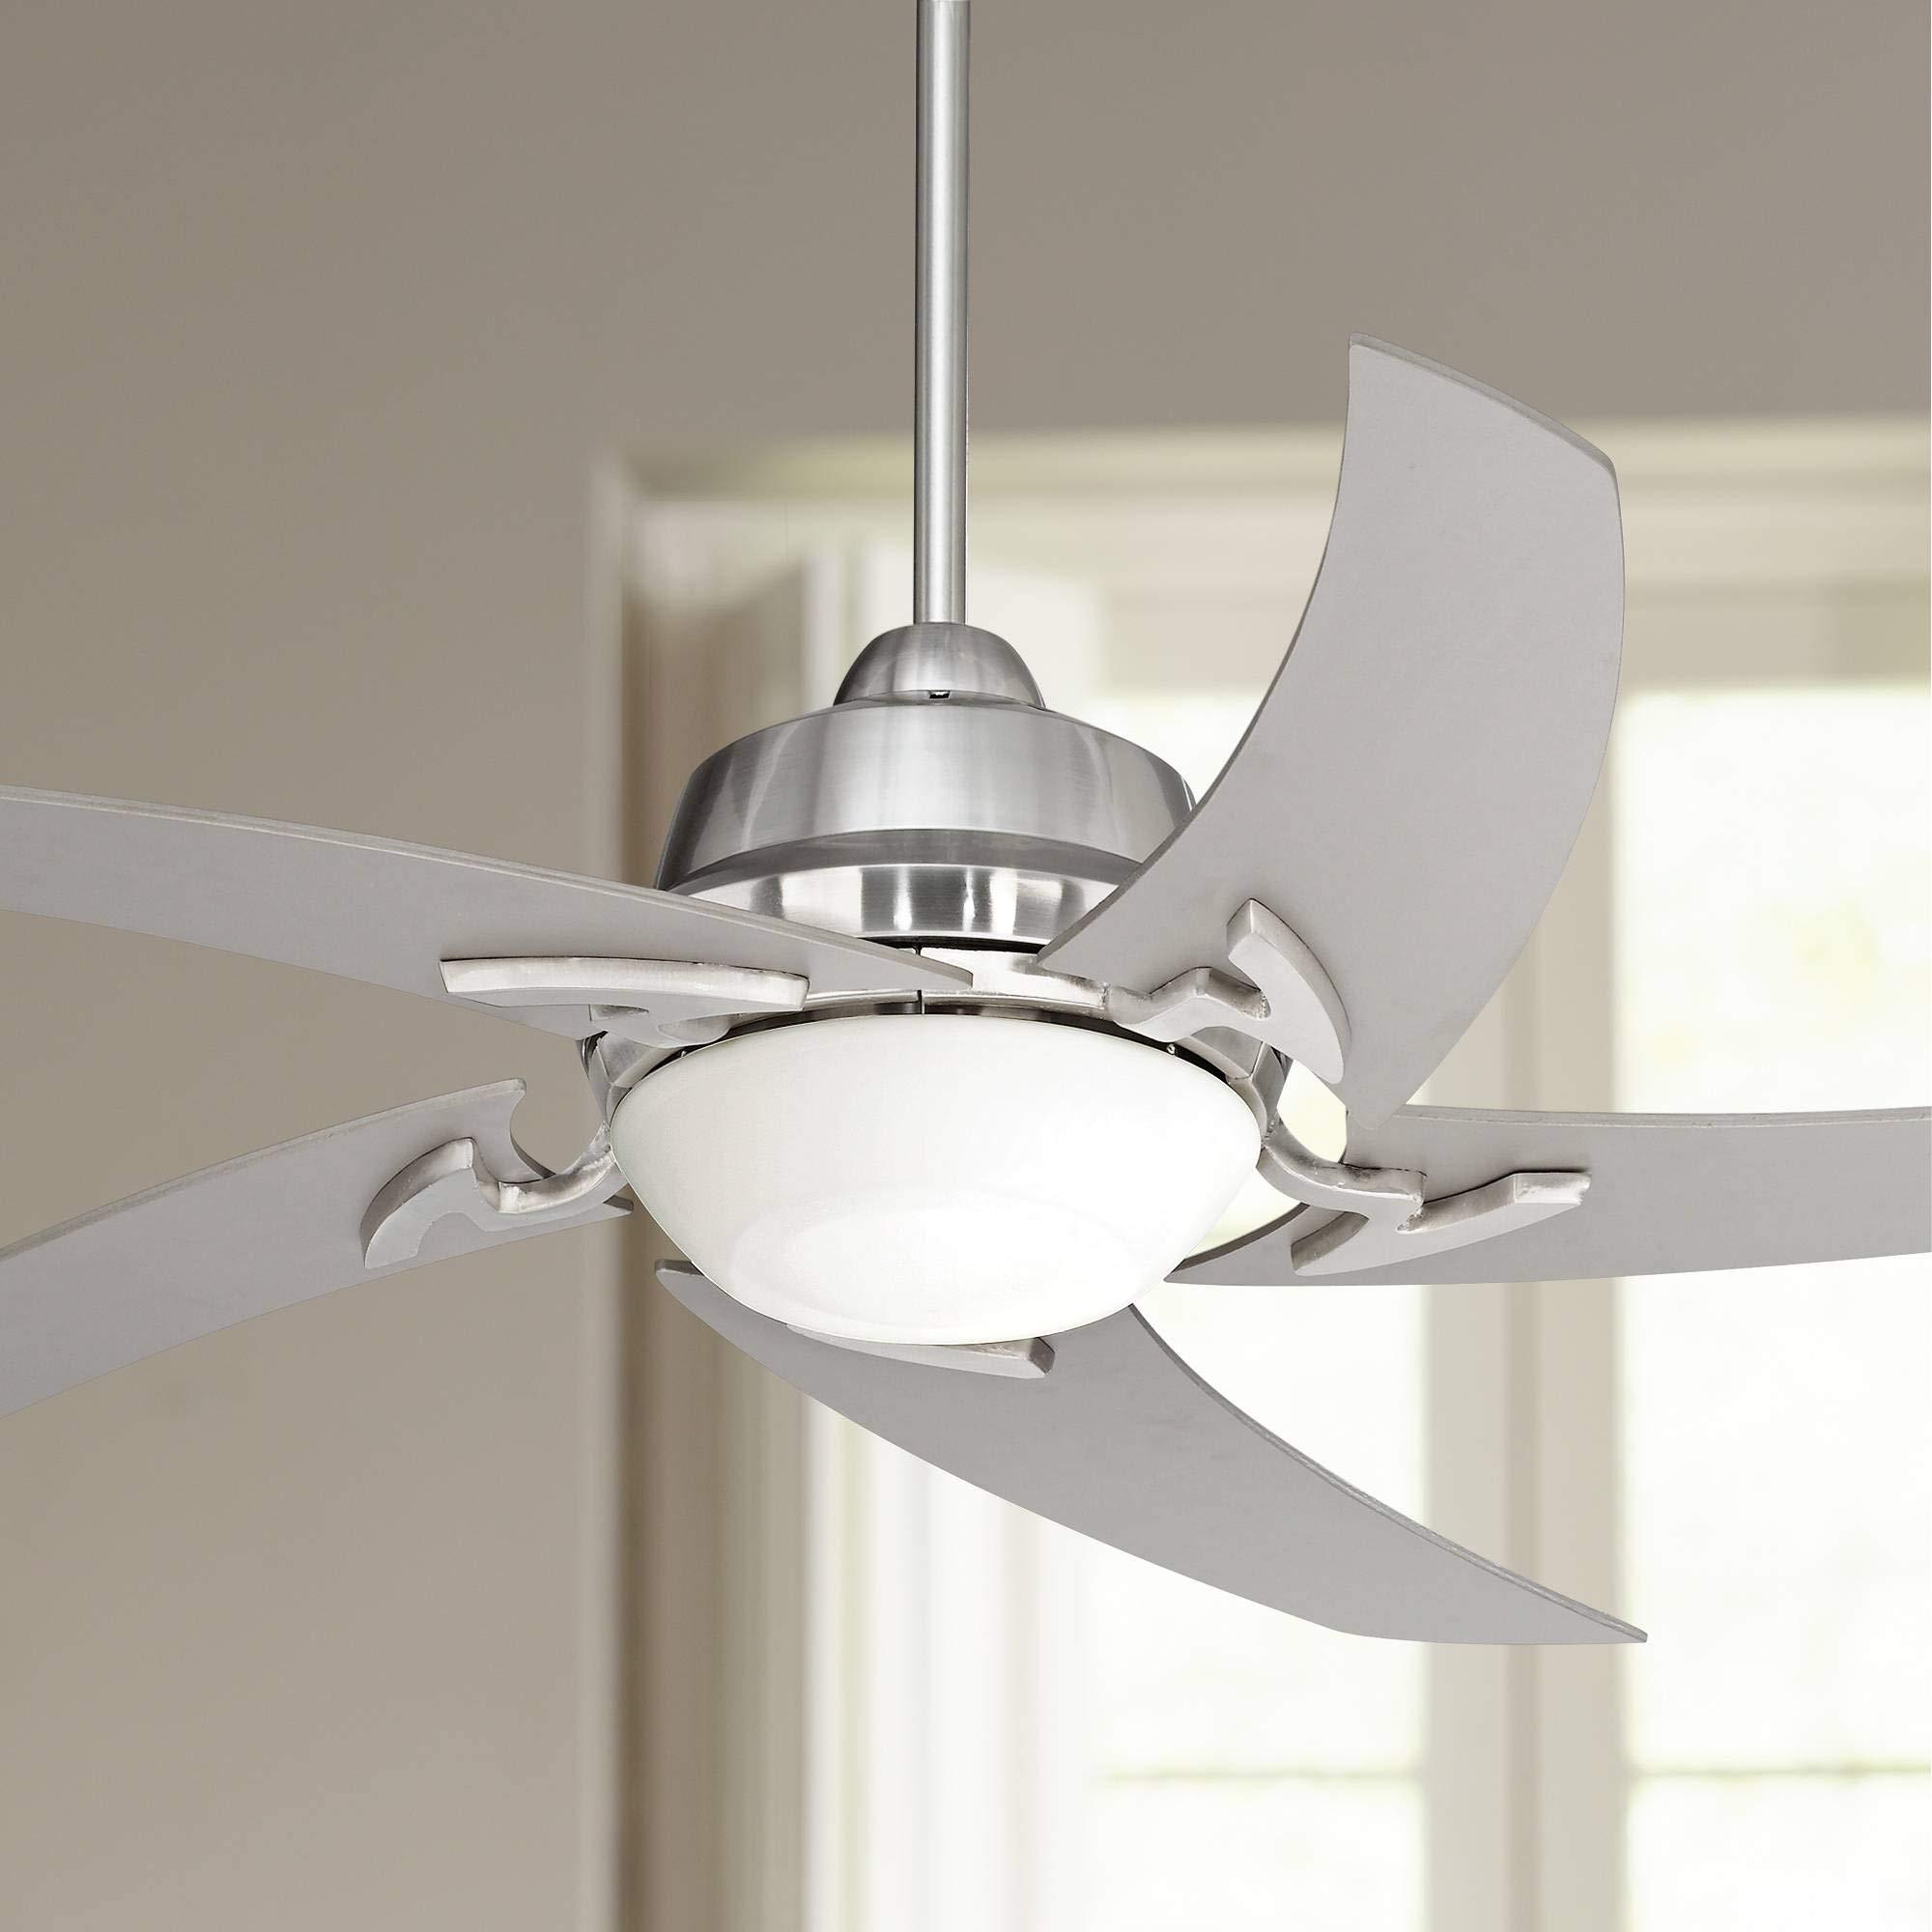 52'' Casa Vieja Capri LED Brushed Nickel Ceiling Fan - Casa Vieja